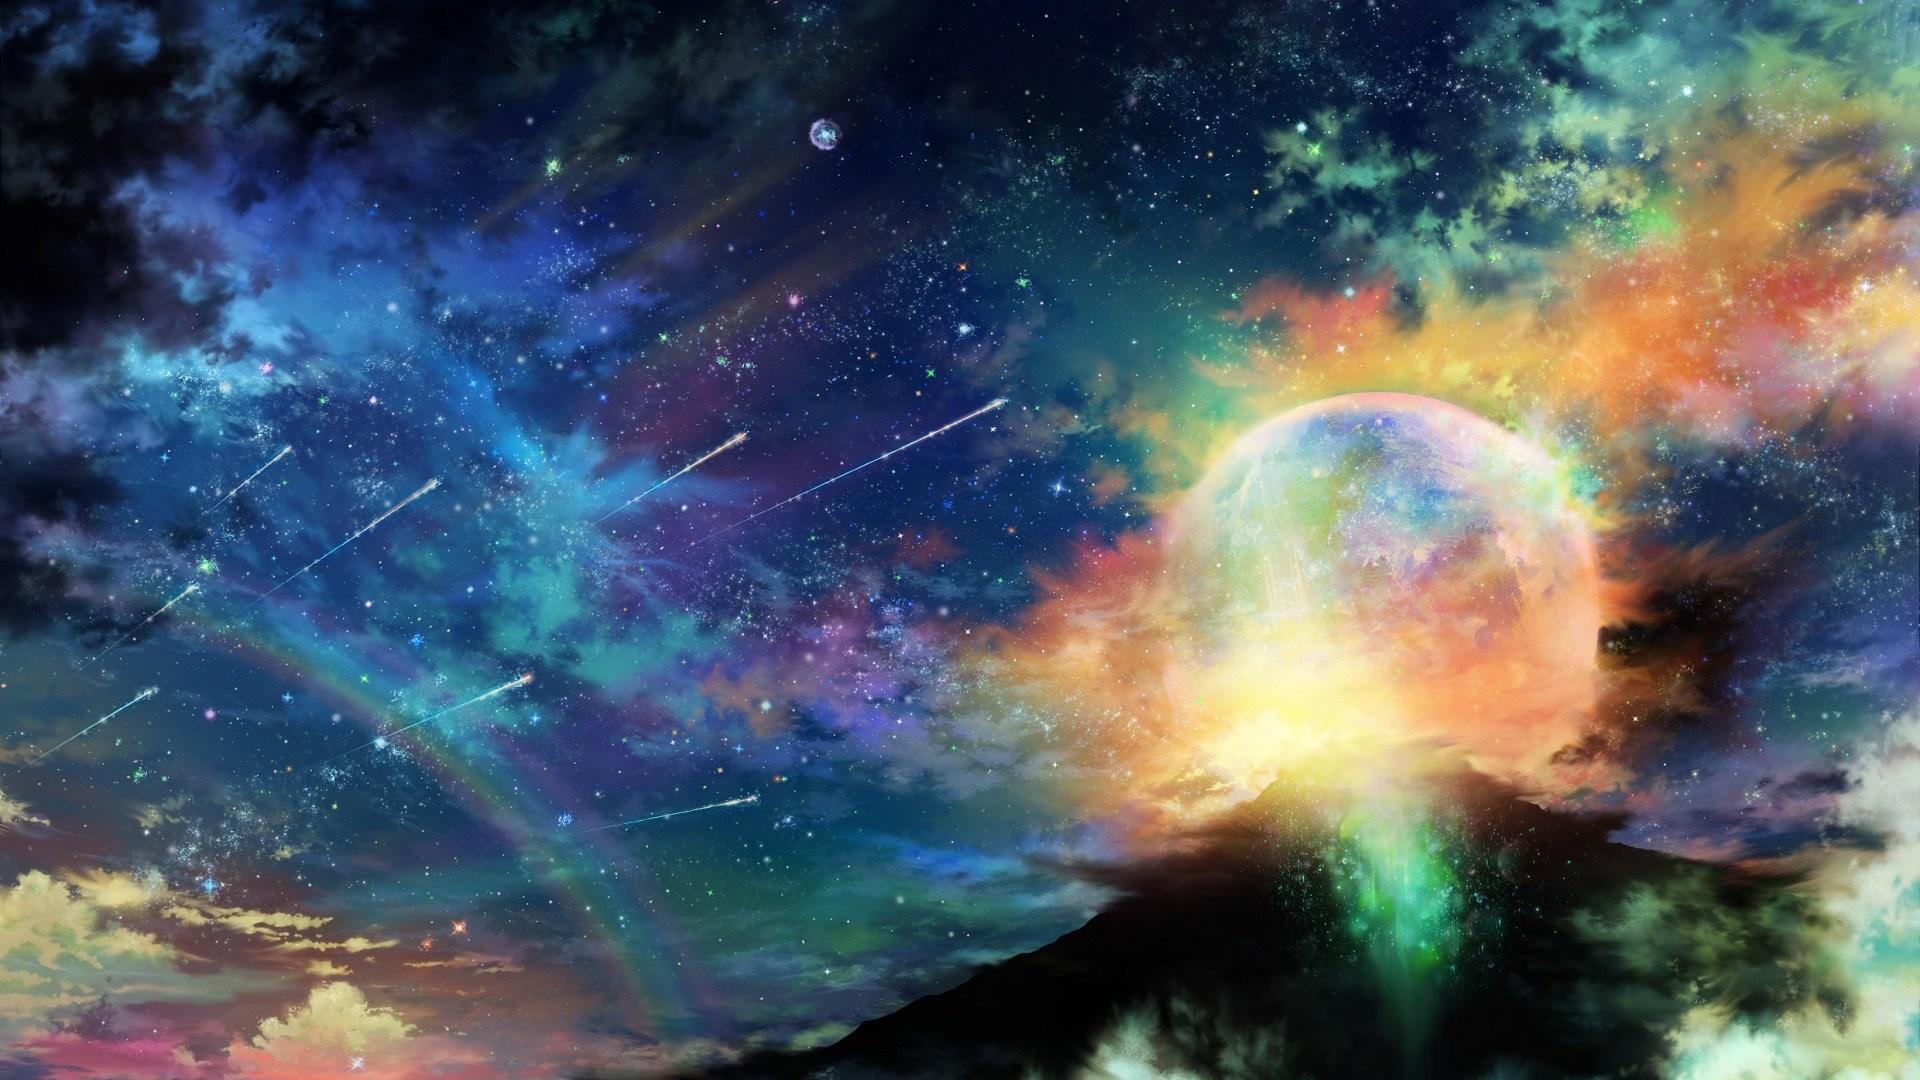 Download Art Tsujiki Planet Night Stars Clouds Rainbow Colorful Galaxy Wallpaper Hd 1925807 Hd Wallpaper Backgrounds Download